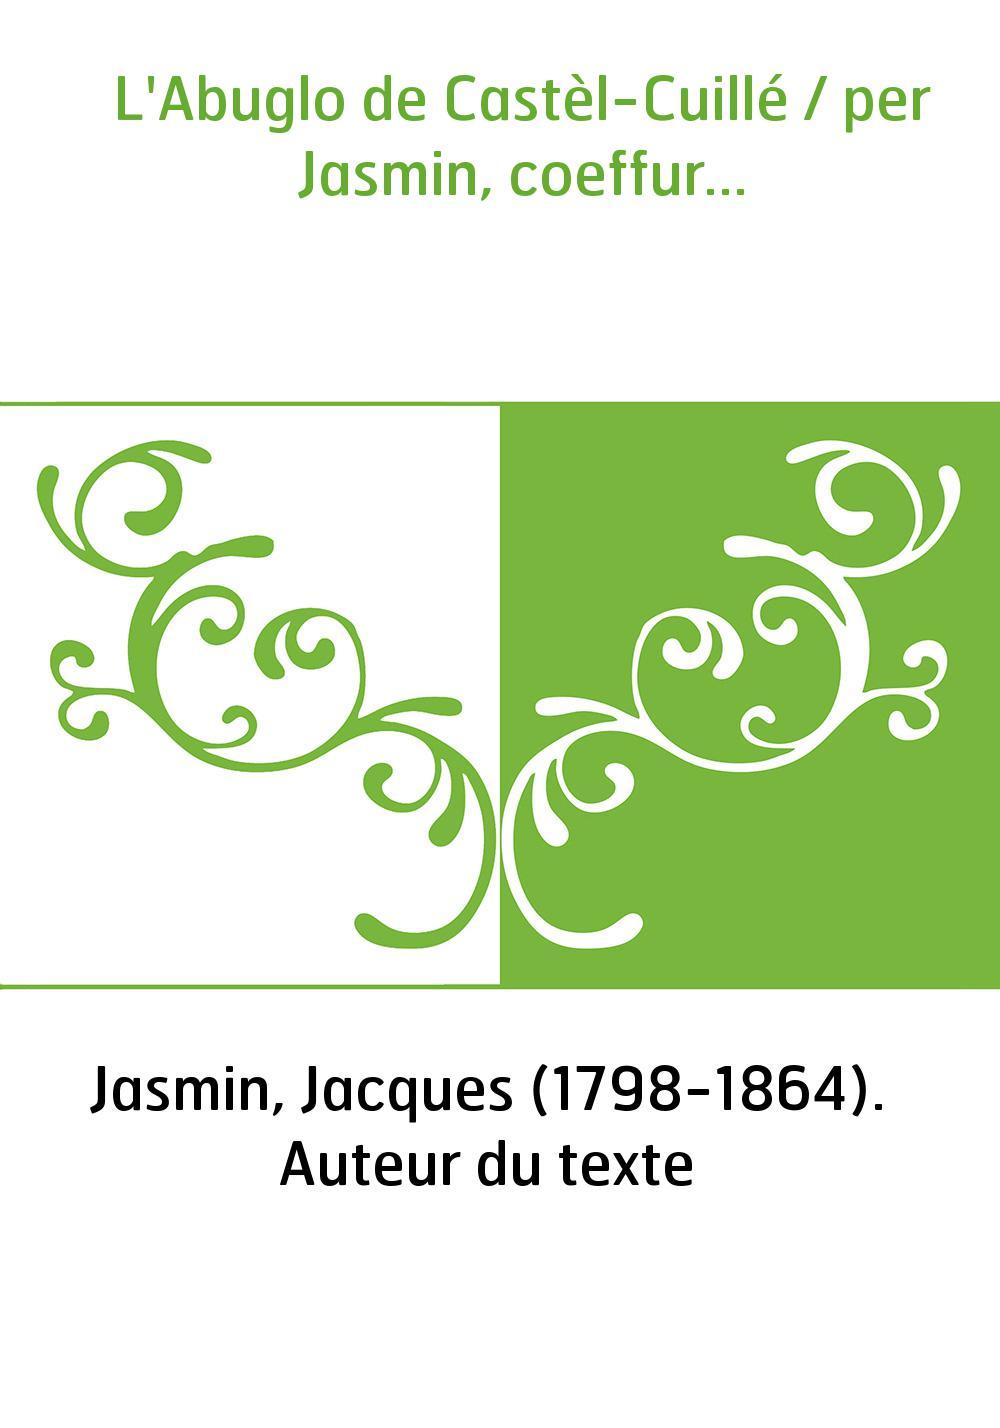 L'Abuglo de Castèl-Cuillé / per Jasmin, coeffur...